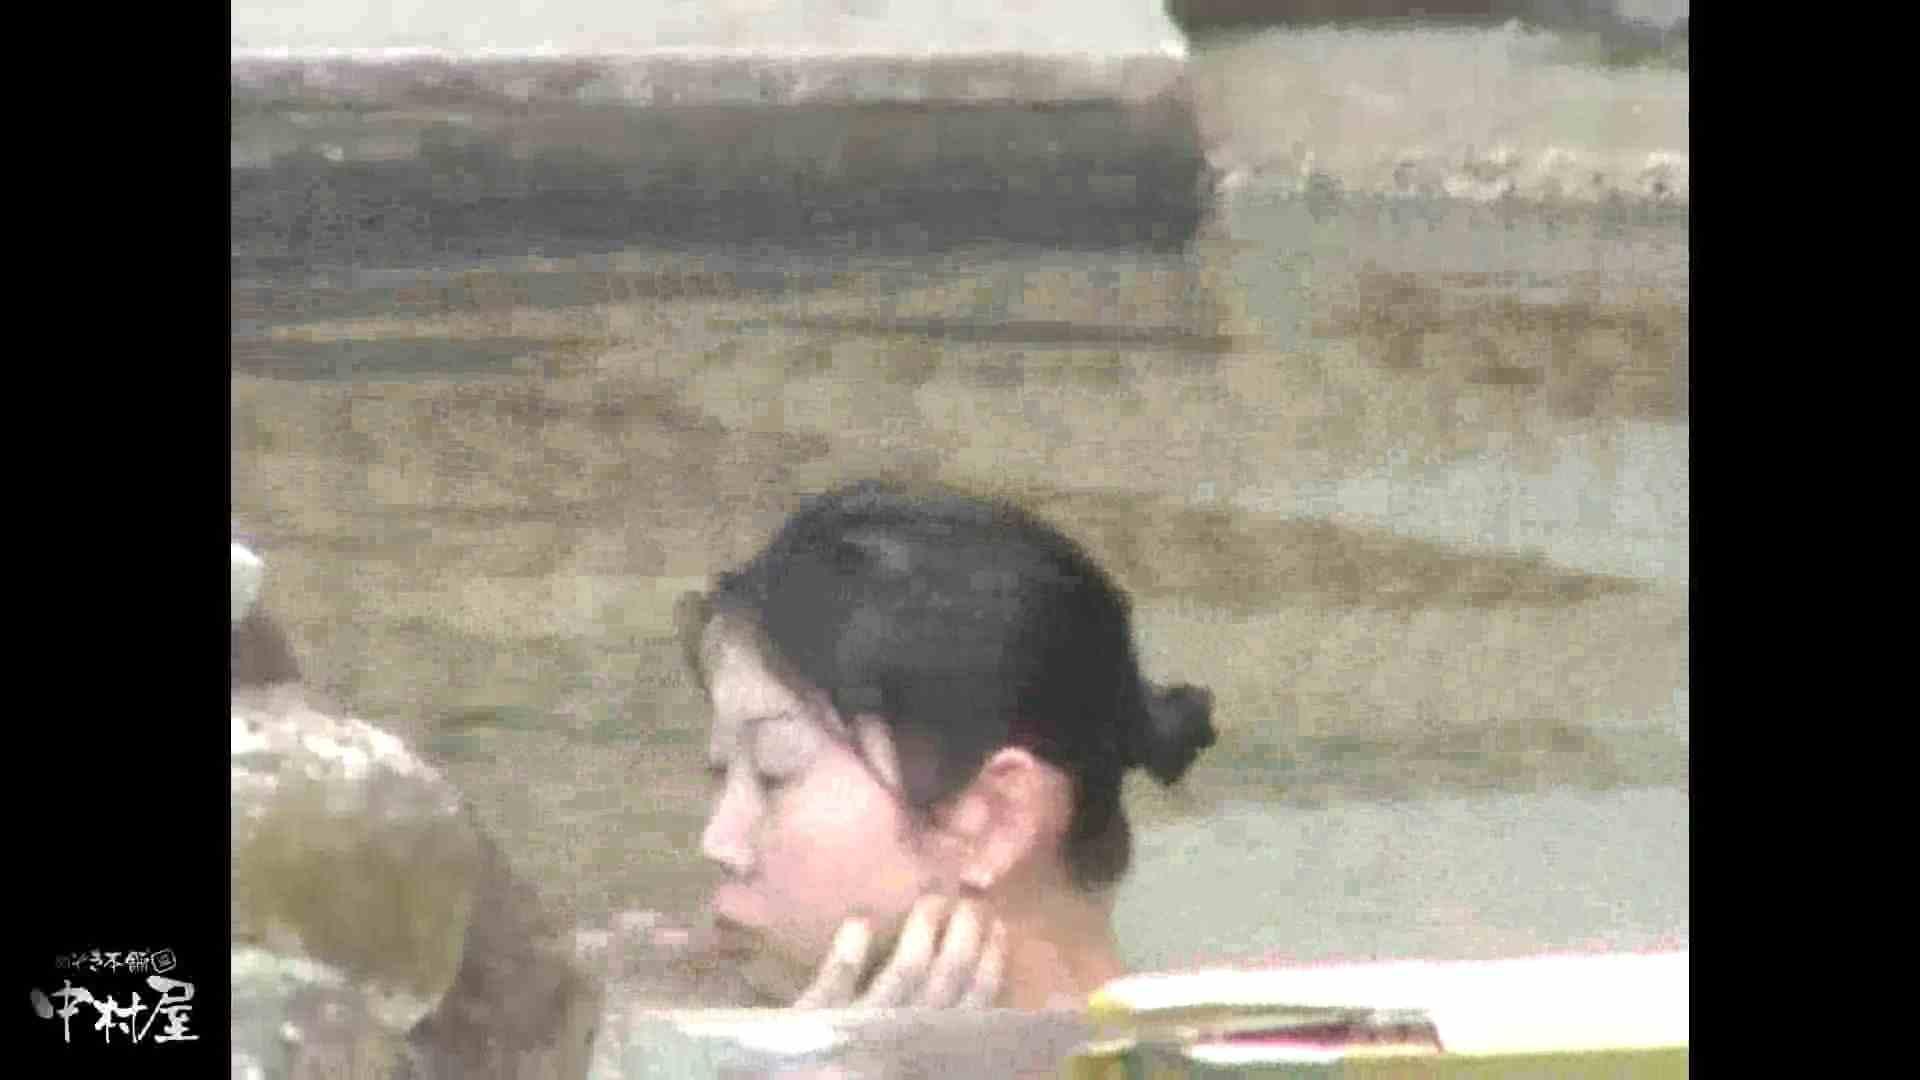 Aquaな露天風呂Vol.881潜入盗撮露天風呂十七判湯 其の三 盗撮 AV動画キャプチャ 72画像 54